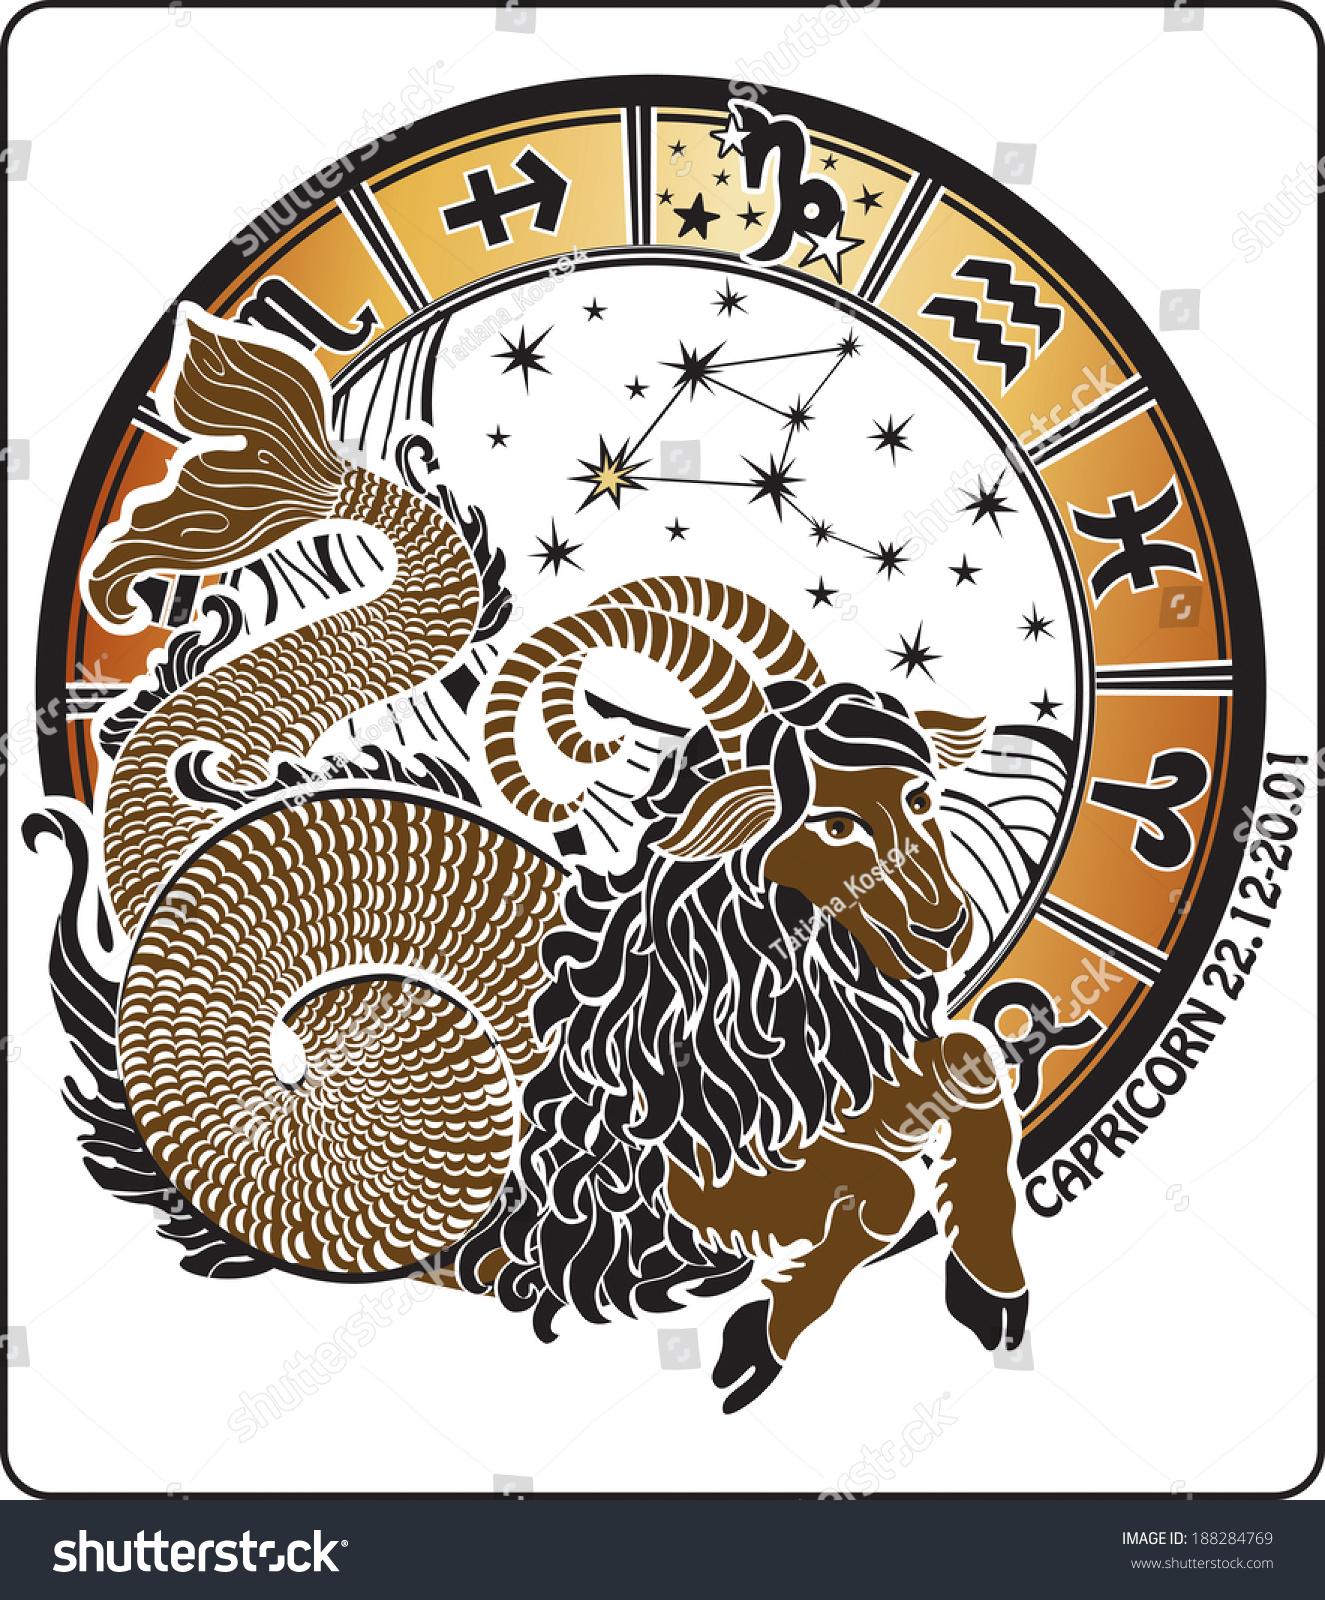 Big Capricorn Symbols All Zodiac Signs Stock Illustration 188284769